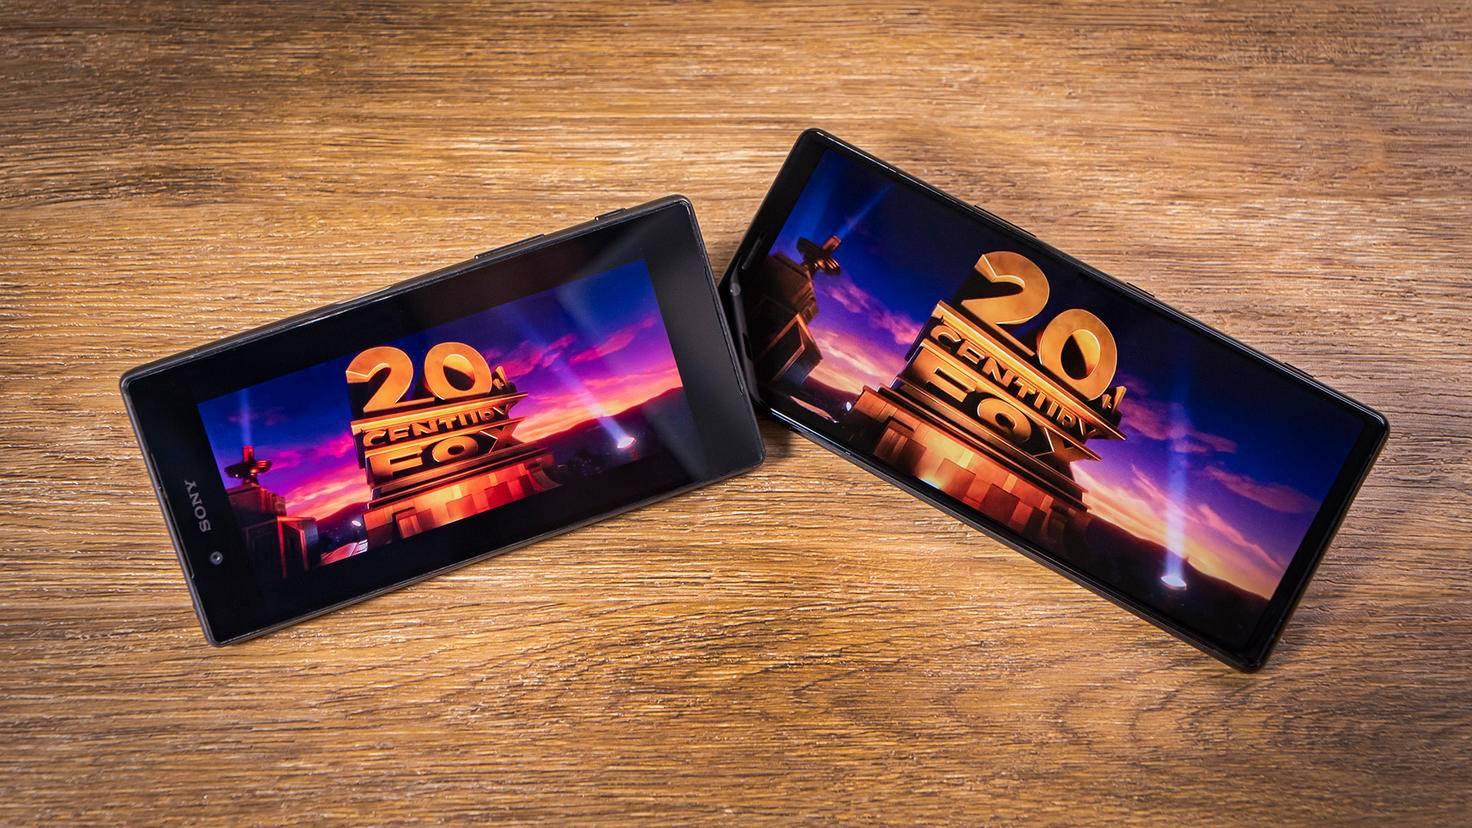 Sony Xperia 1 Filmerlebnis ohne schwarze Balken